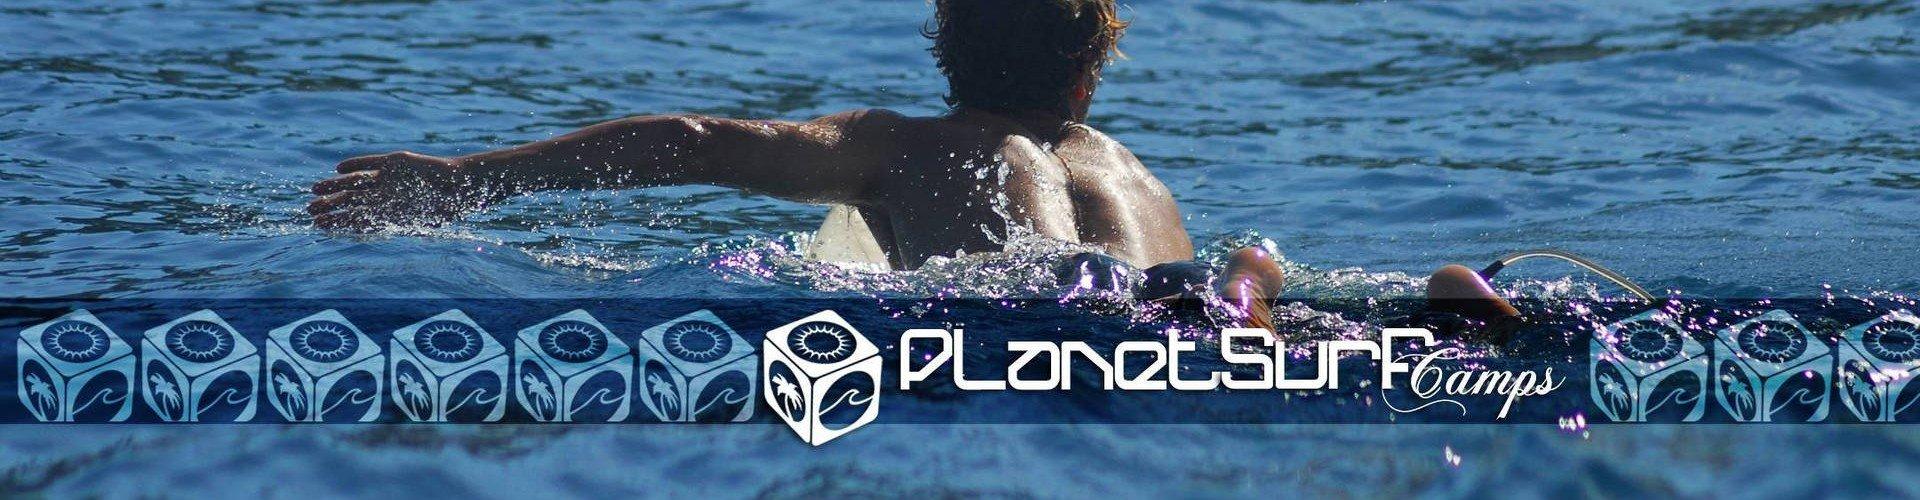 Planet surfer en busca de la Ola